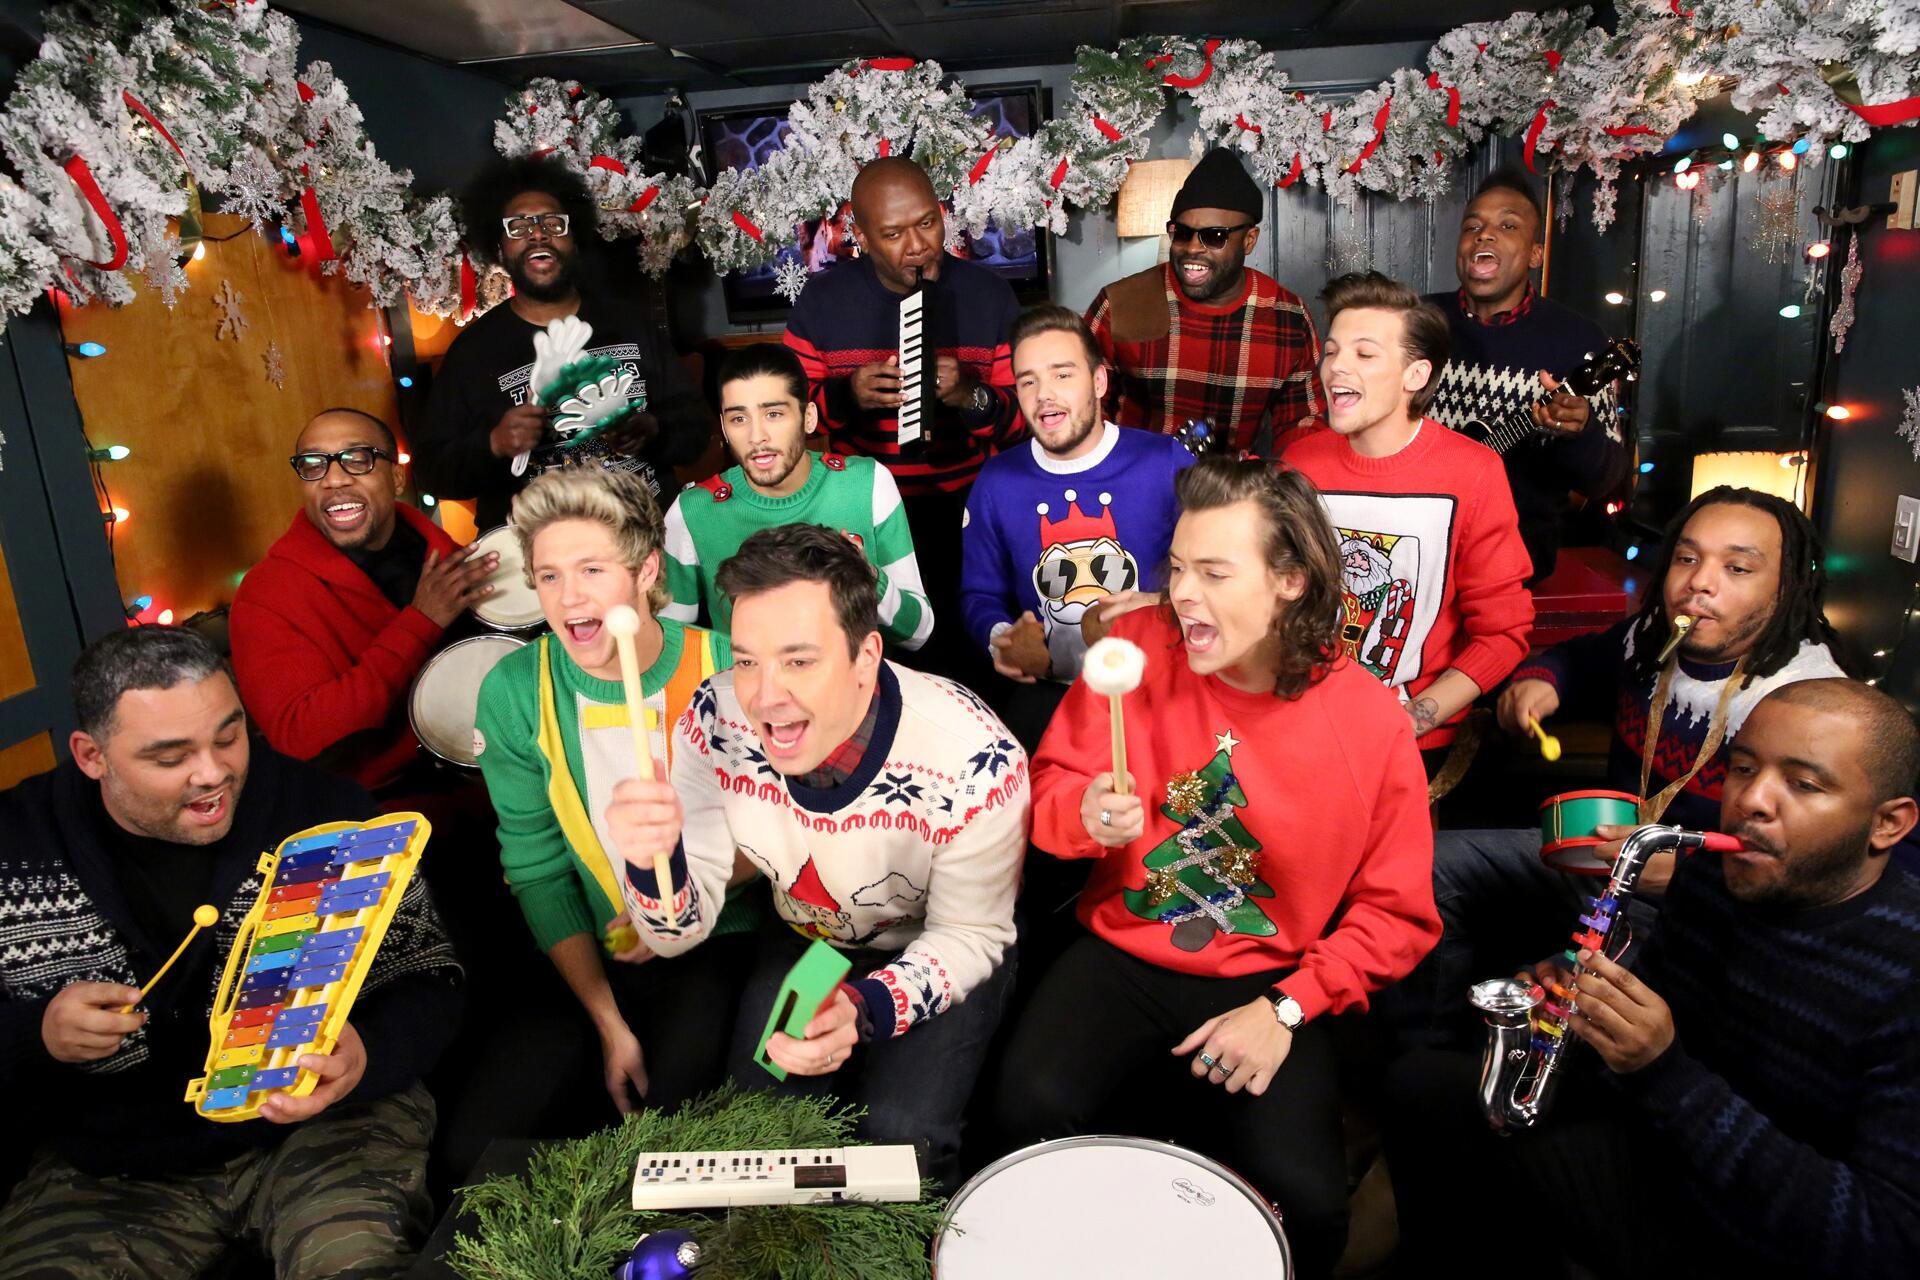 Bild zu One Direction, Weihnachten, Ugly Sweater, Niall Horan, Zayn Malik, Harry Styles